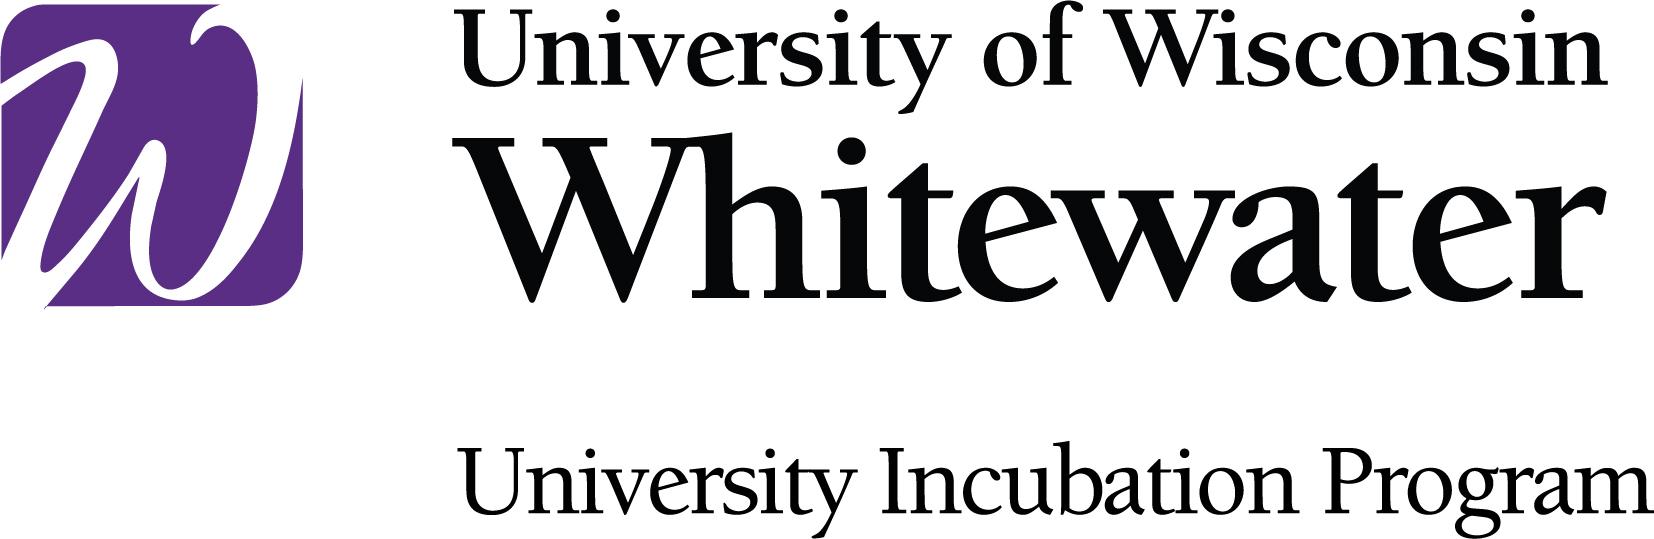 UW-Whitewater_University Incubation Program_logo_2c_horizontalstacked (1).jpg